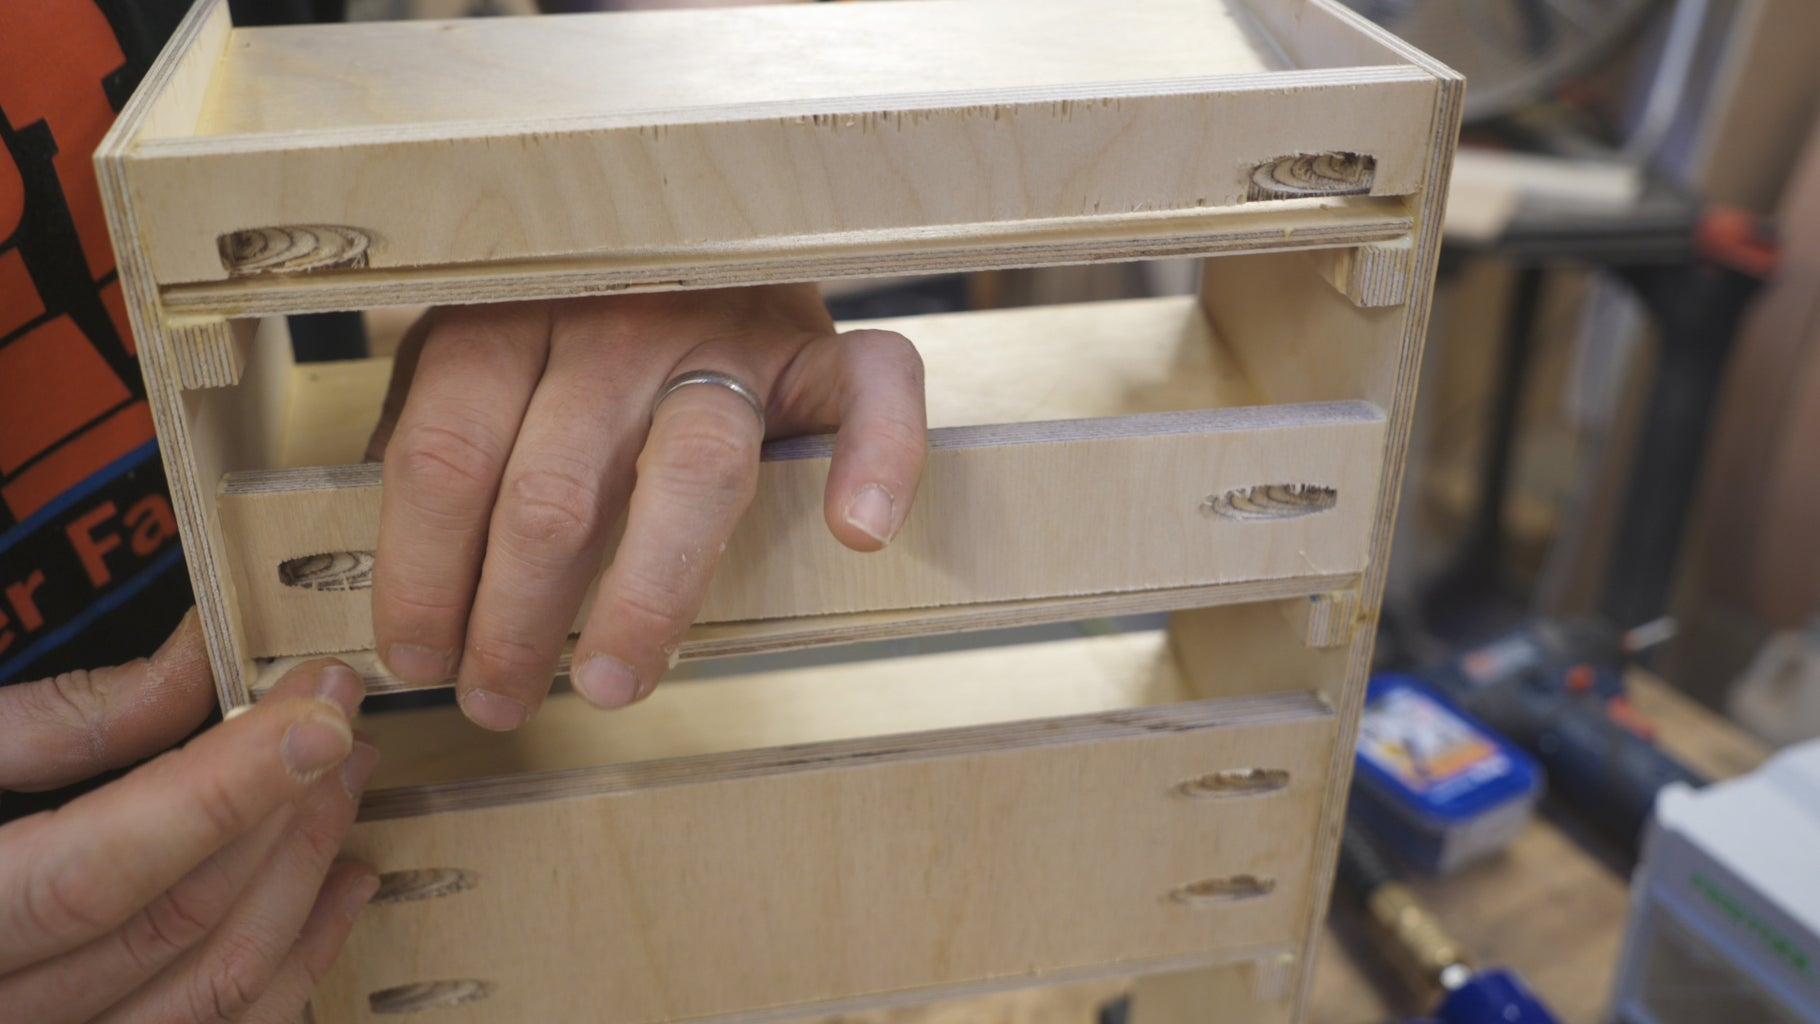 Assembly - Glue Shelves and Backs